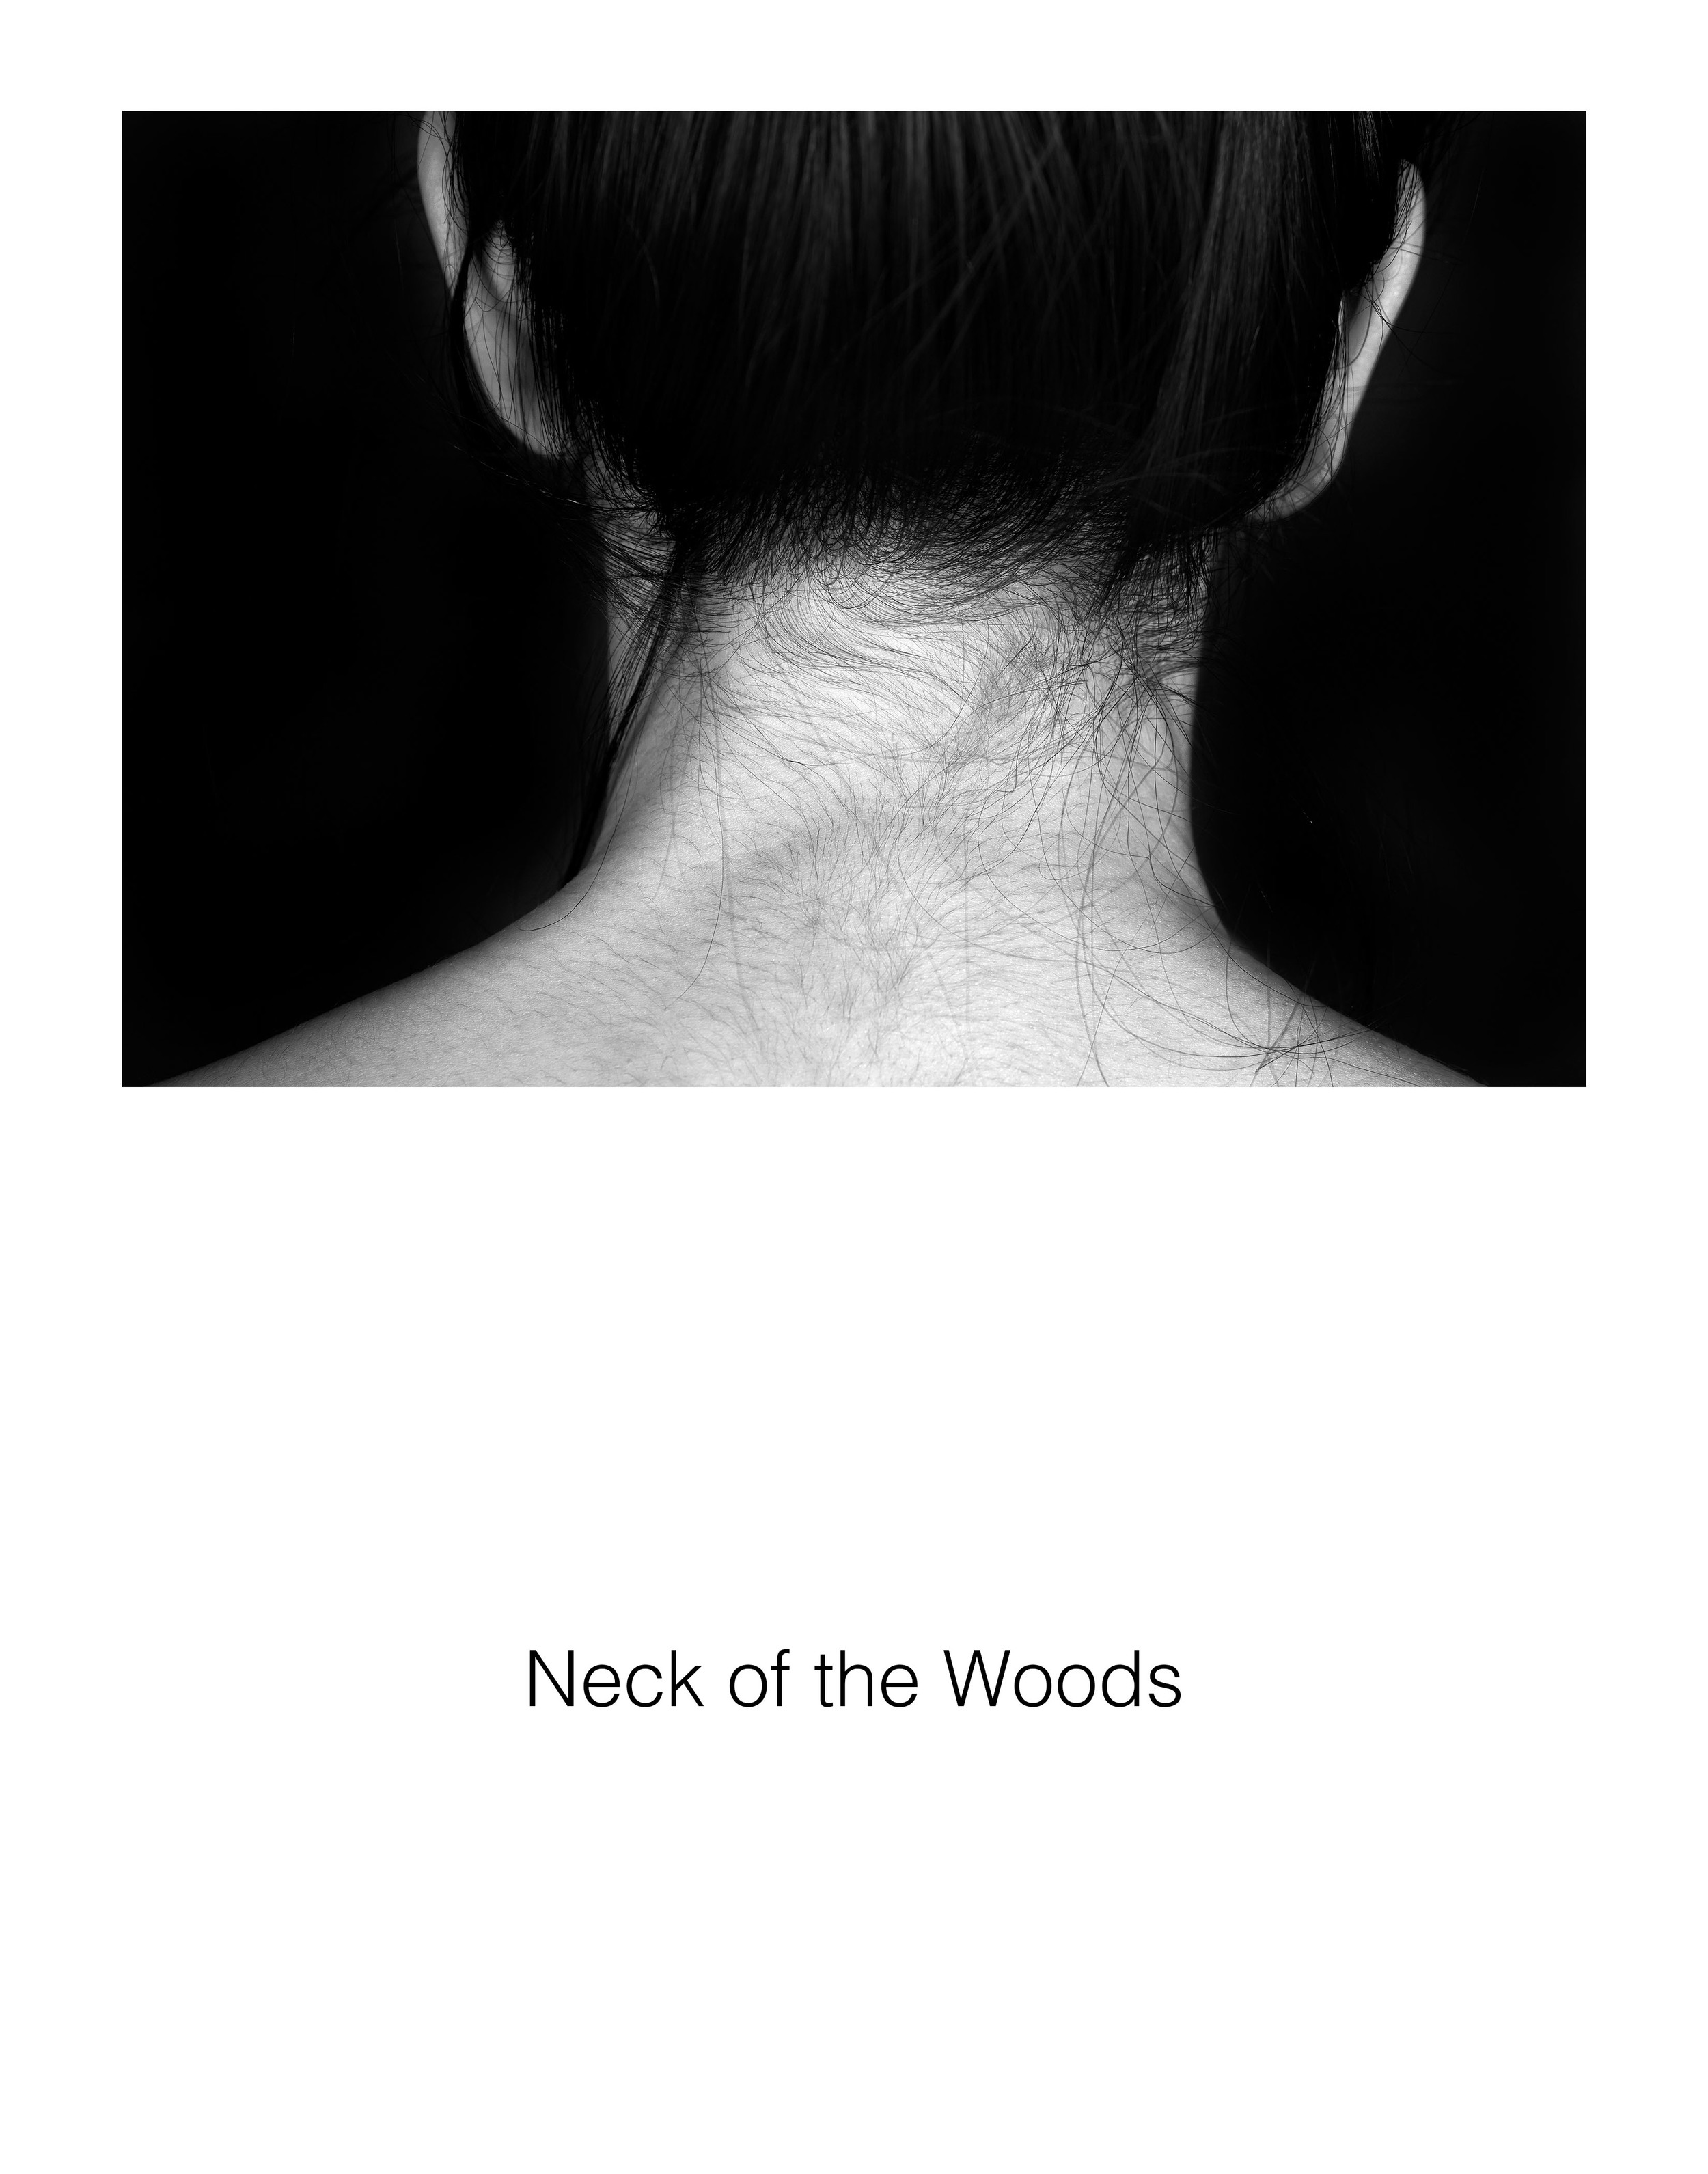 neckofthewoods.jpg